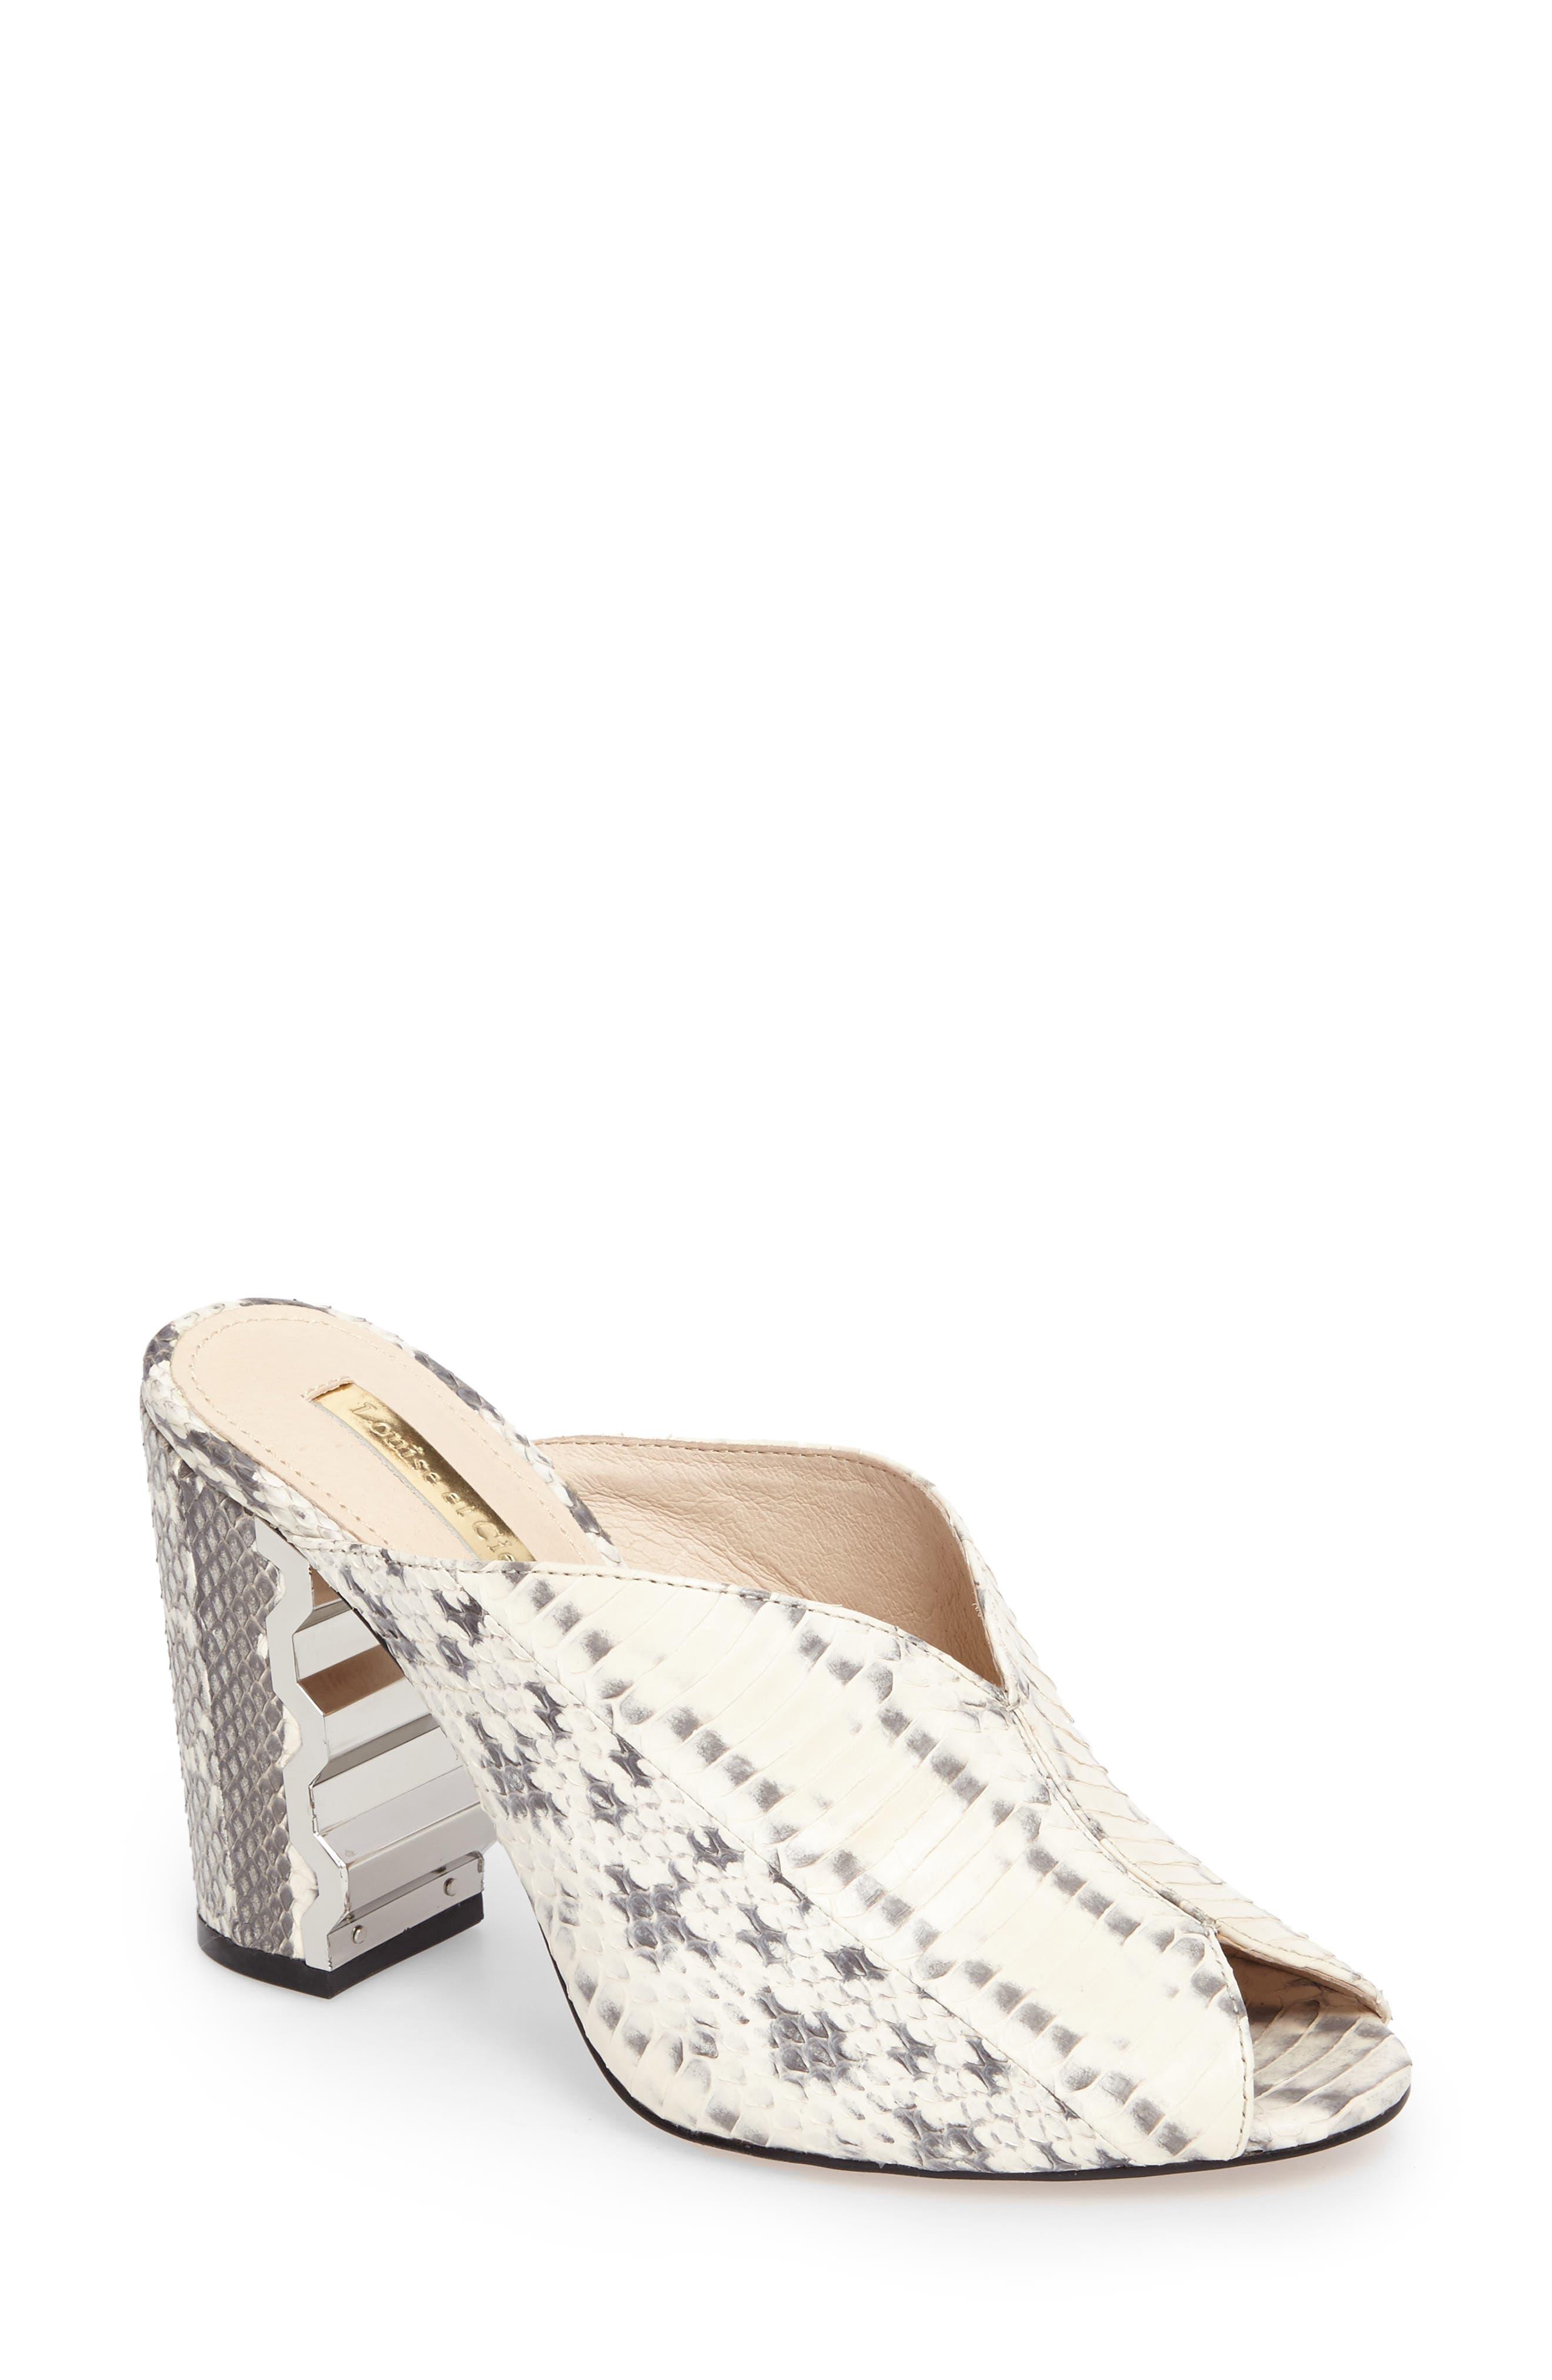 Korella II Block Heel Mule,                             Main thumbnail 1, color,                             Black/ White Leather